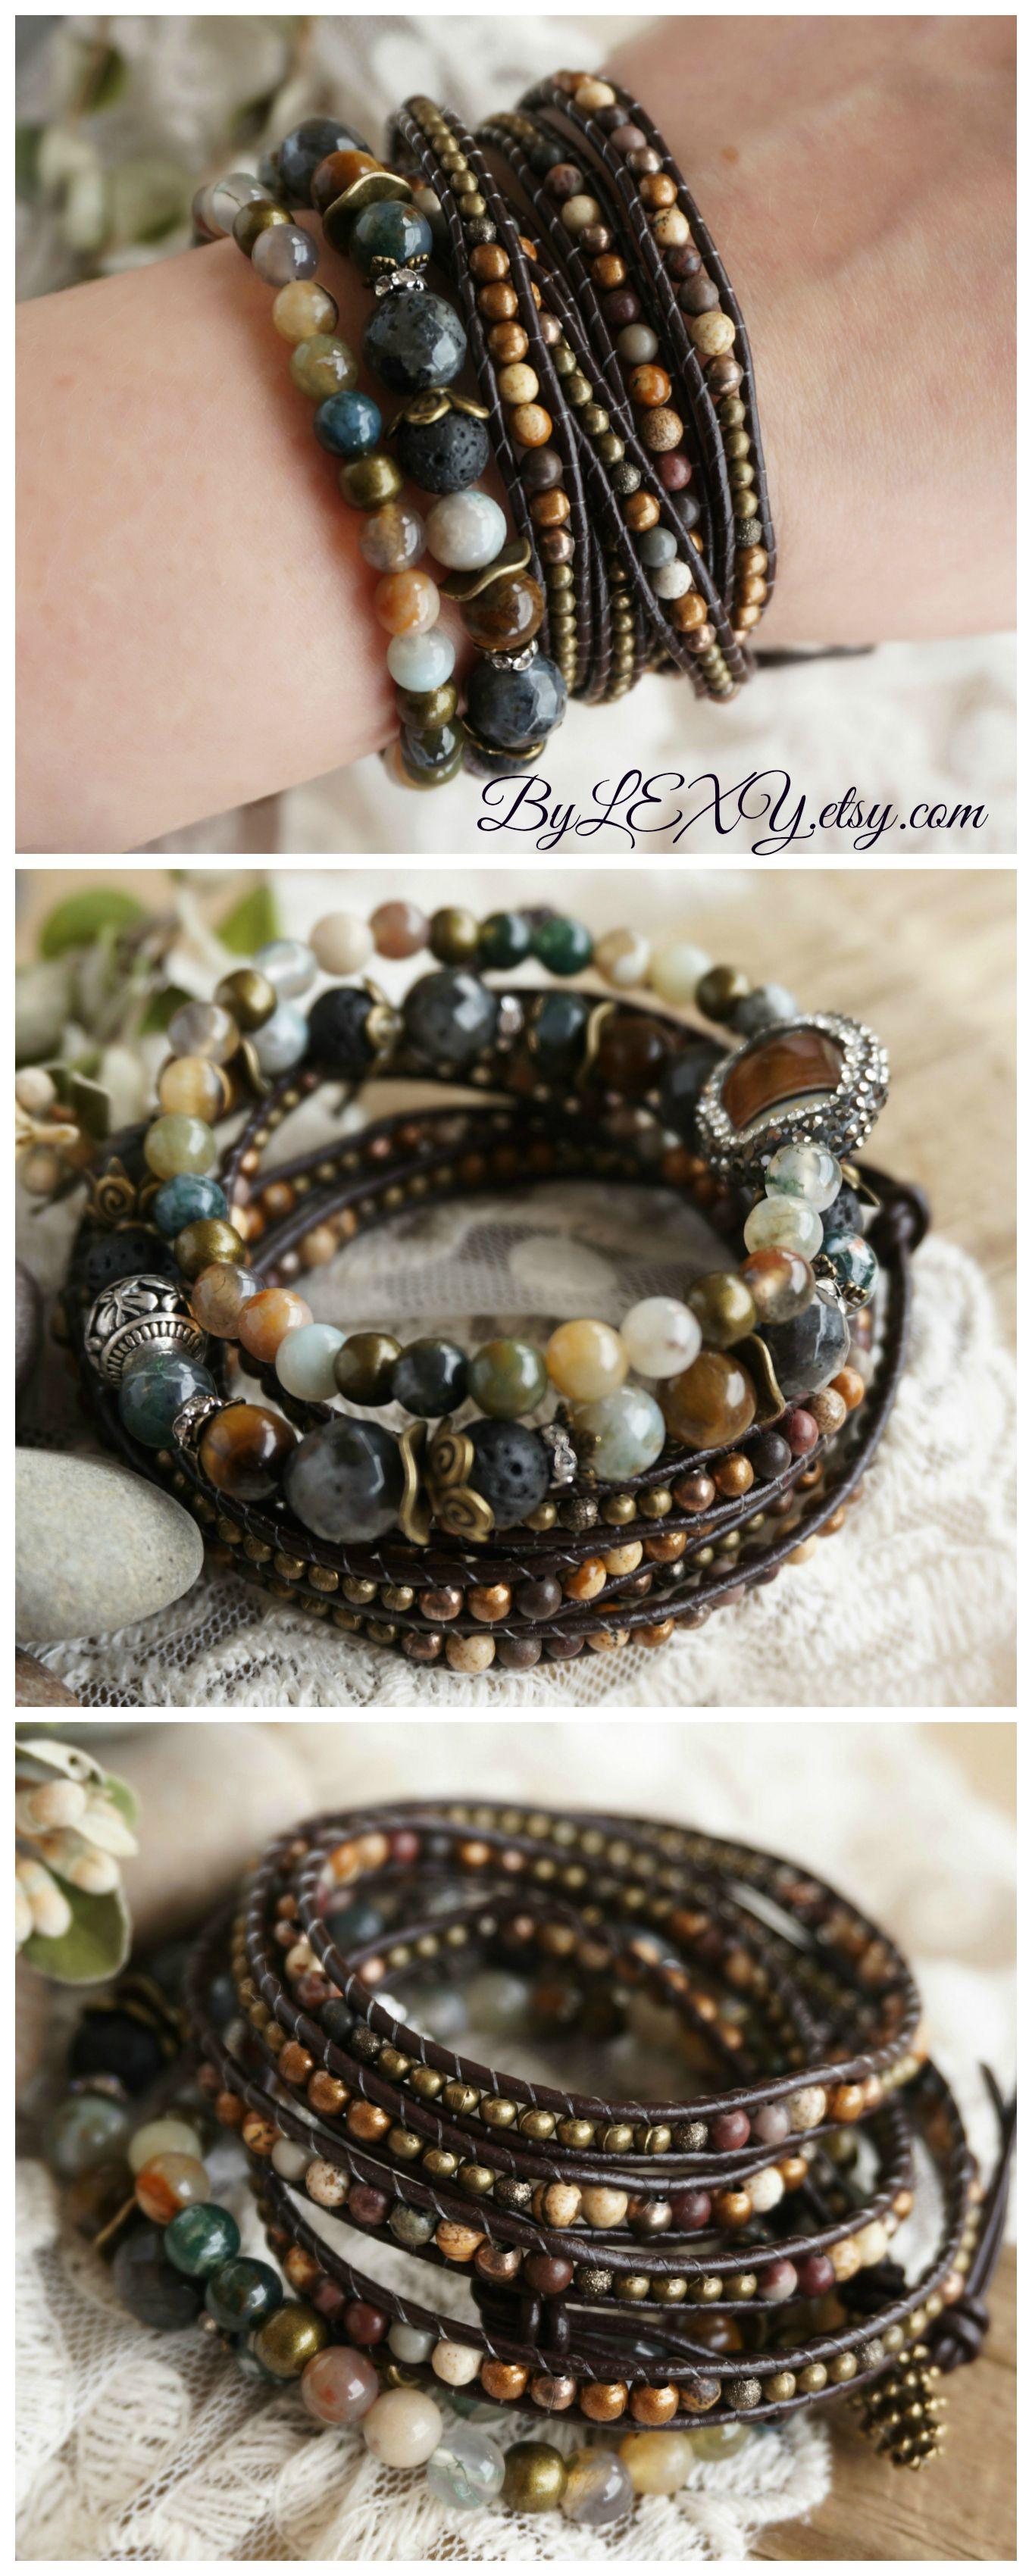 a6152ce36c4ef MallDou Jewelry Handmade Coloful Leather Cuff Bracelet Wrap Bangle ...